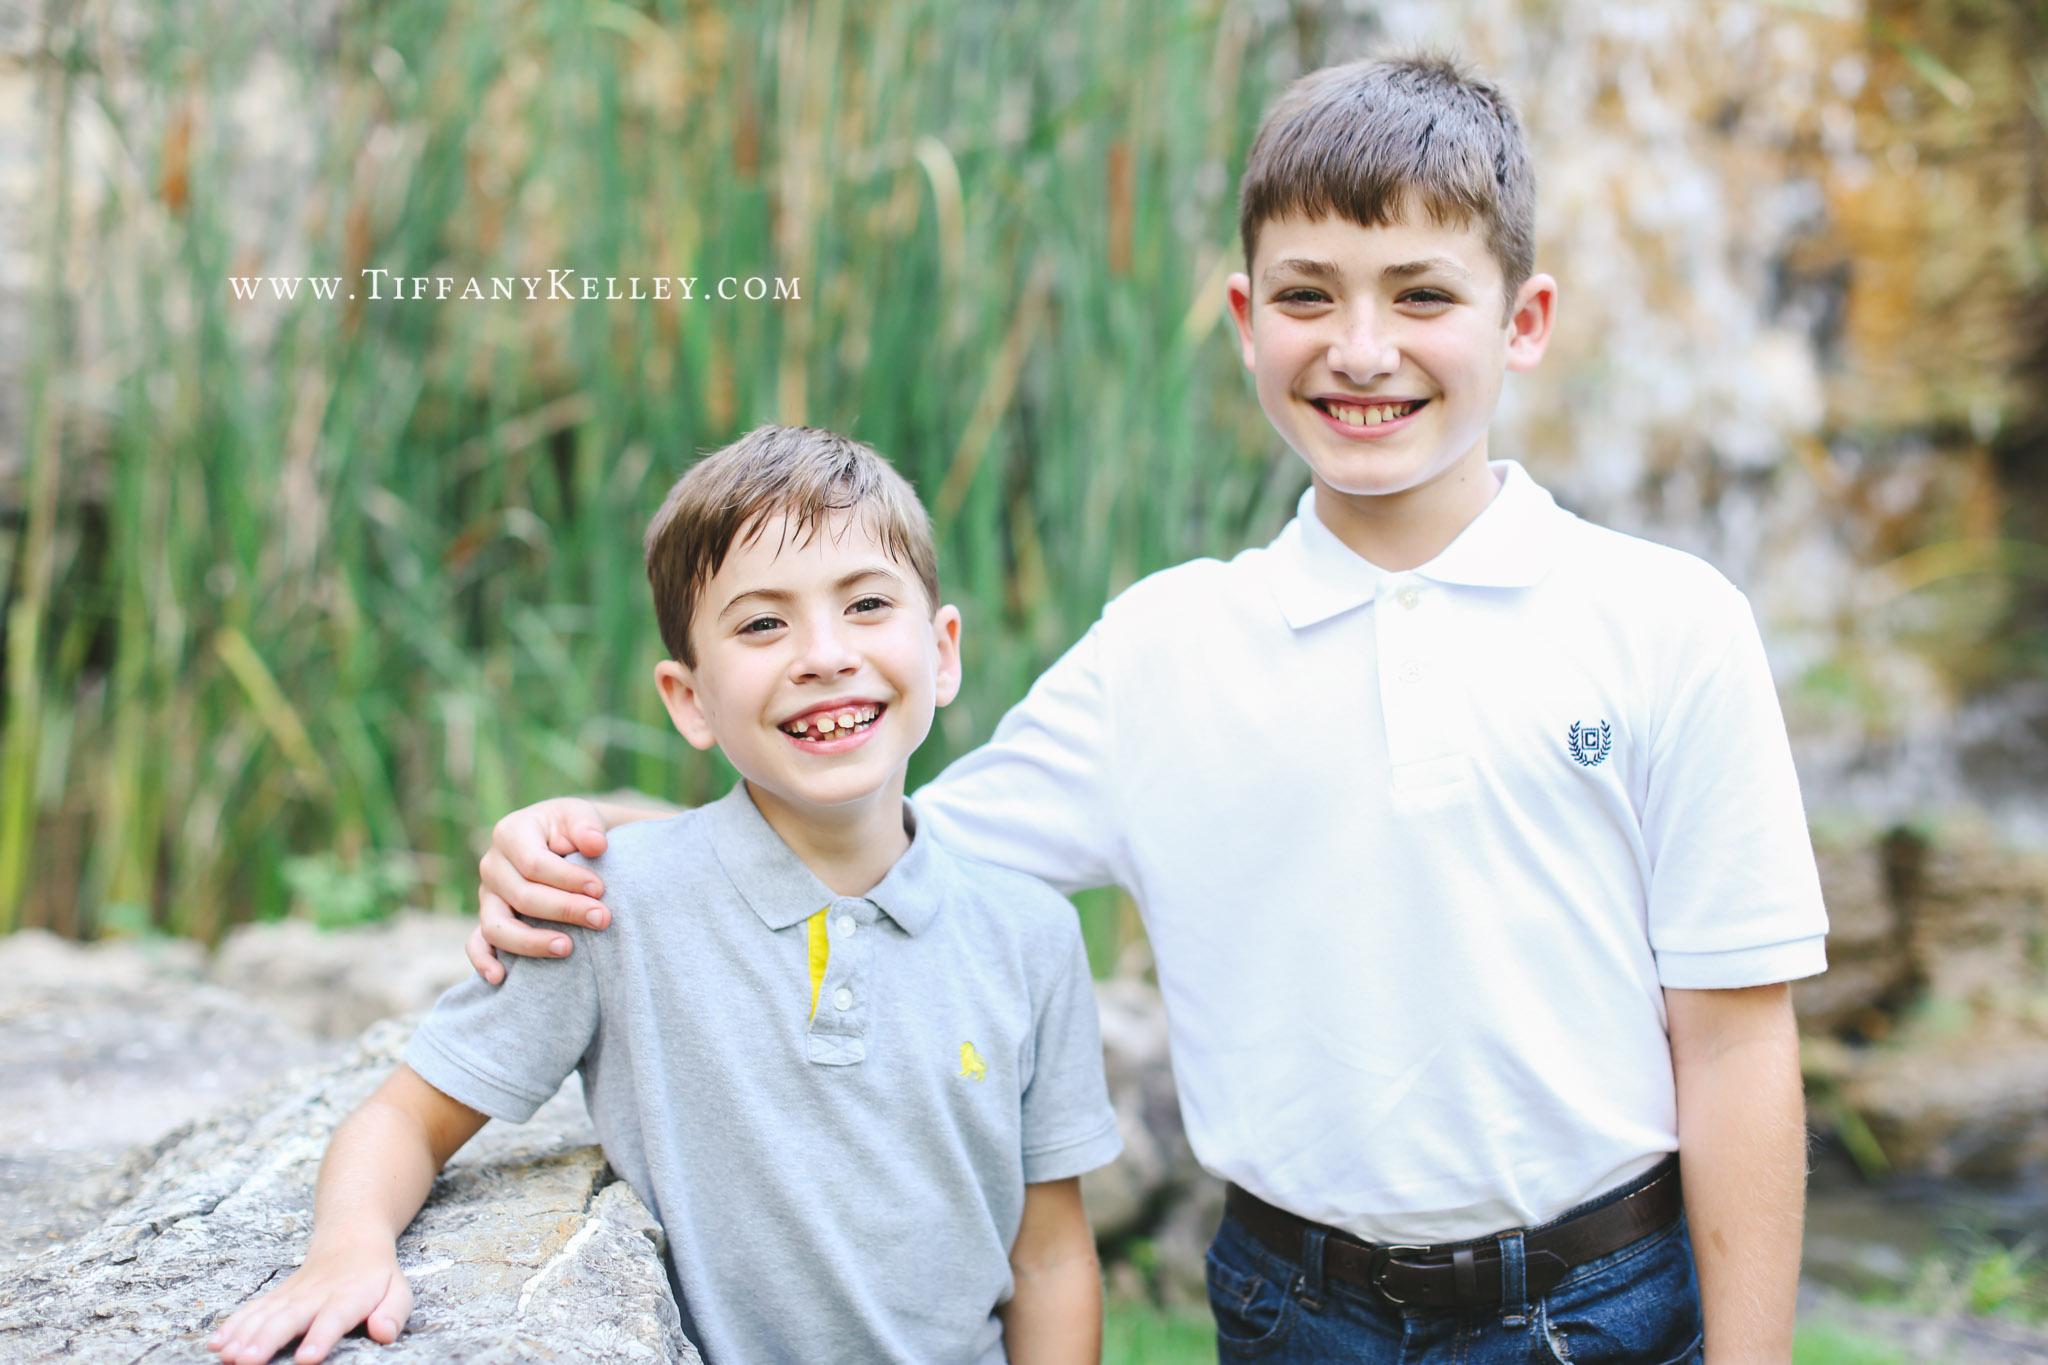 02 Big Cedar Lodge Photographer - Branson MO Family Photographer - Tiffany Kelley Photography